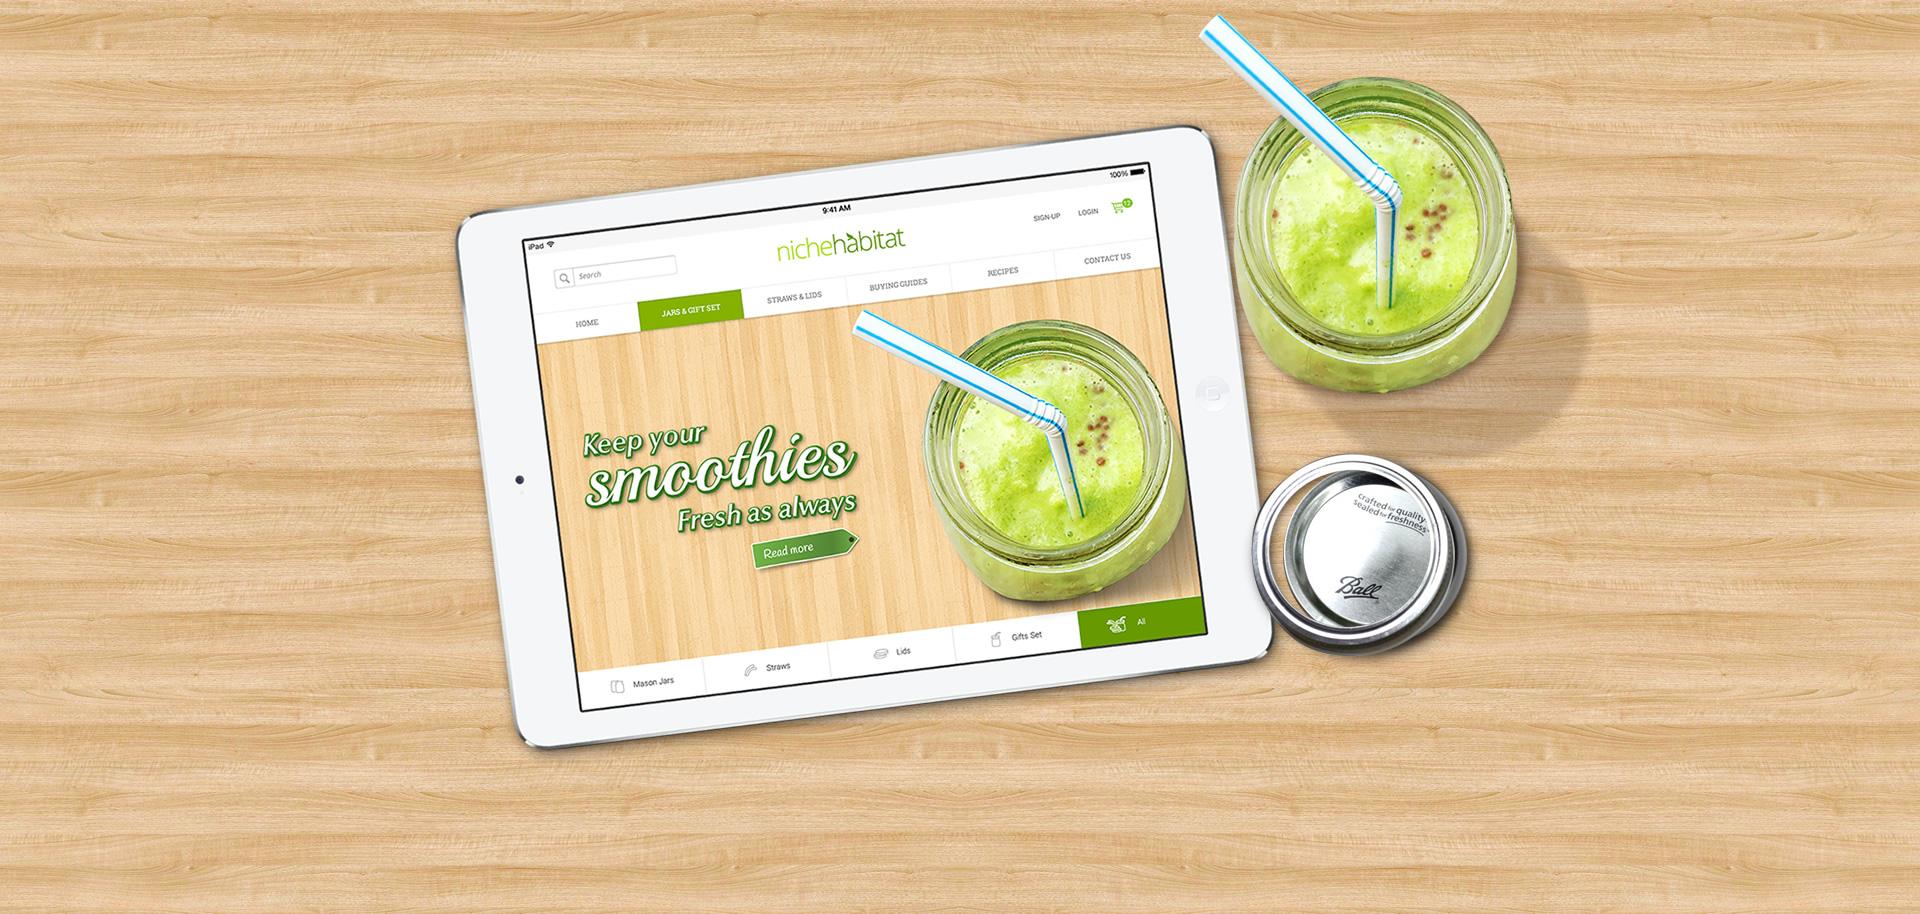 smoothies website design malaysia